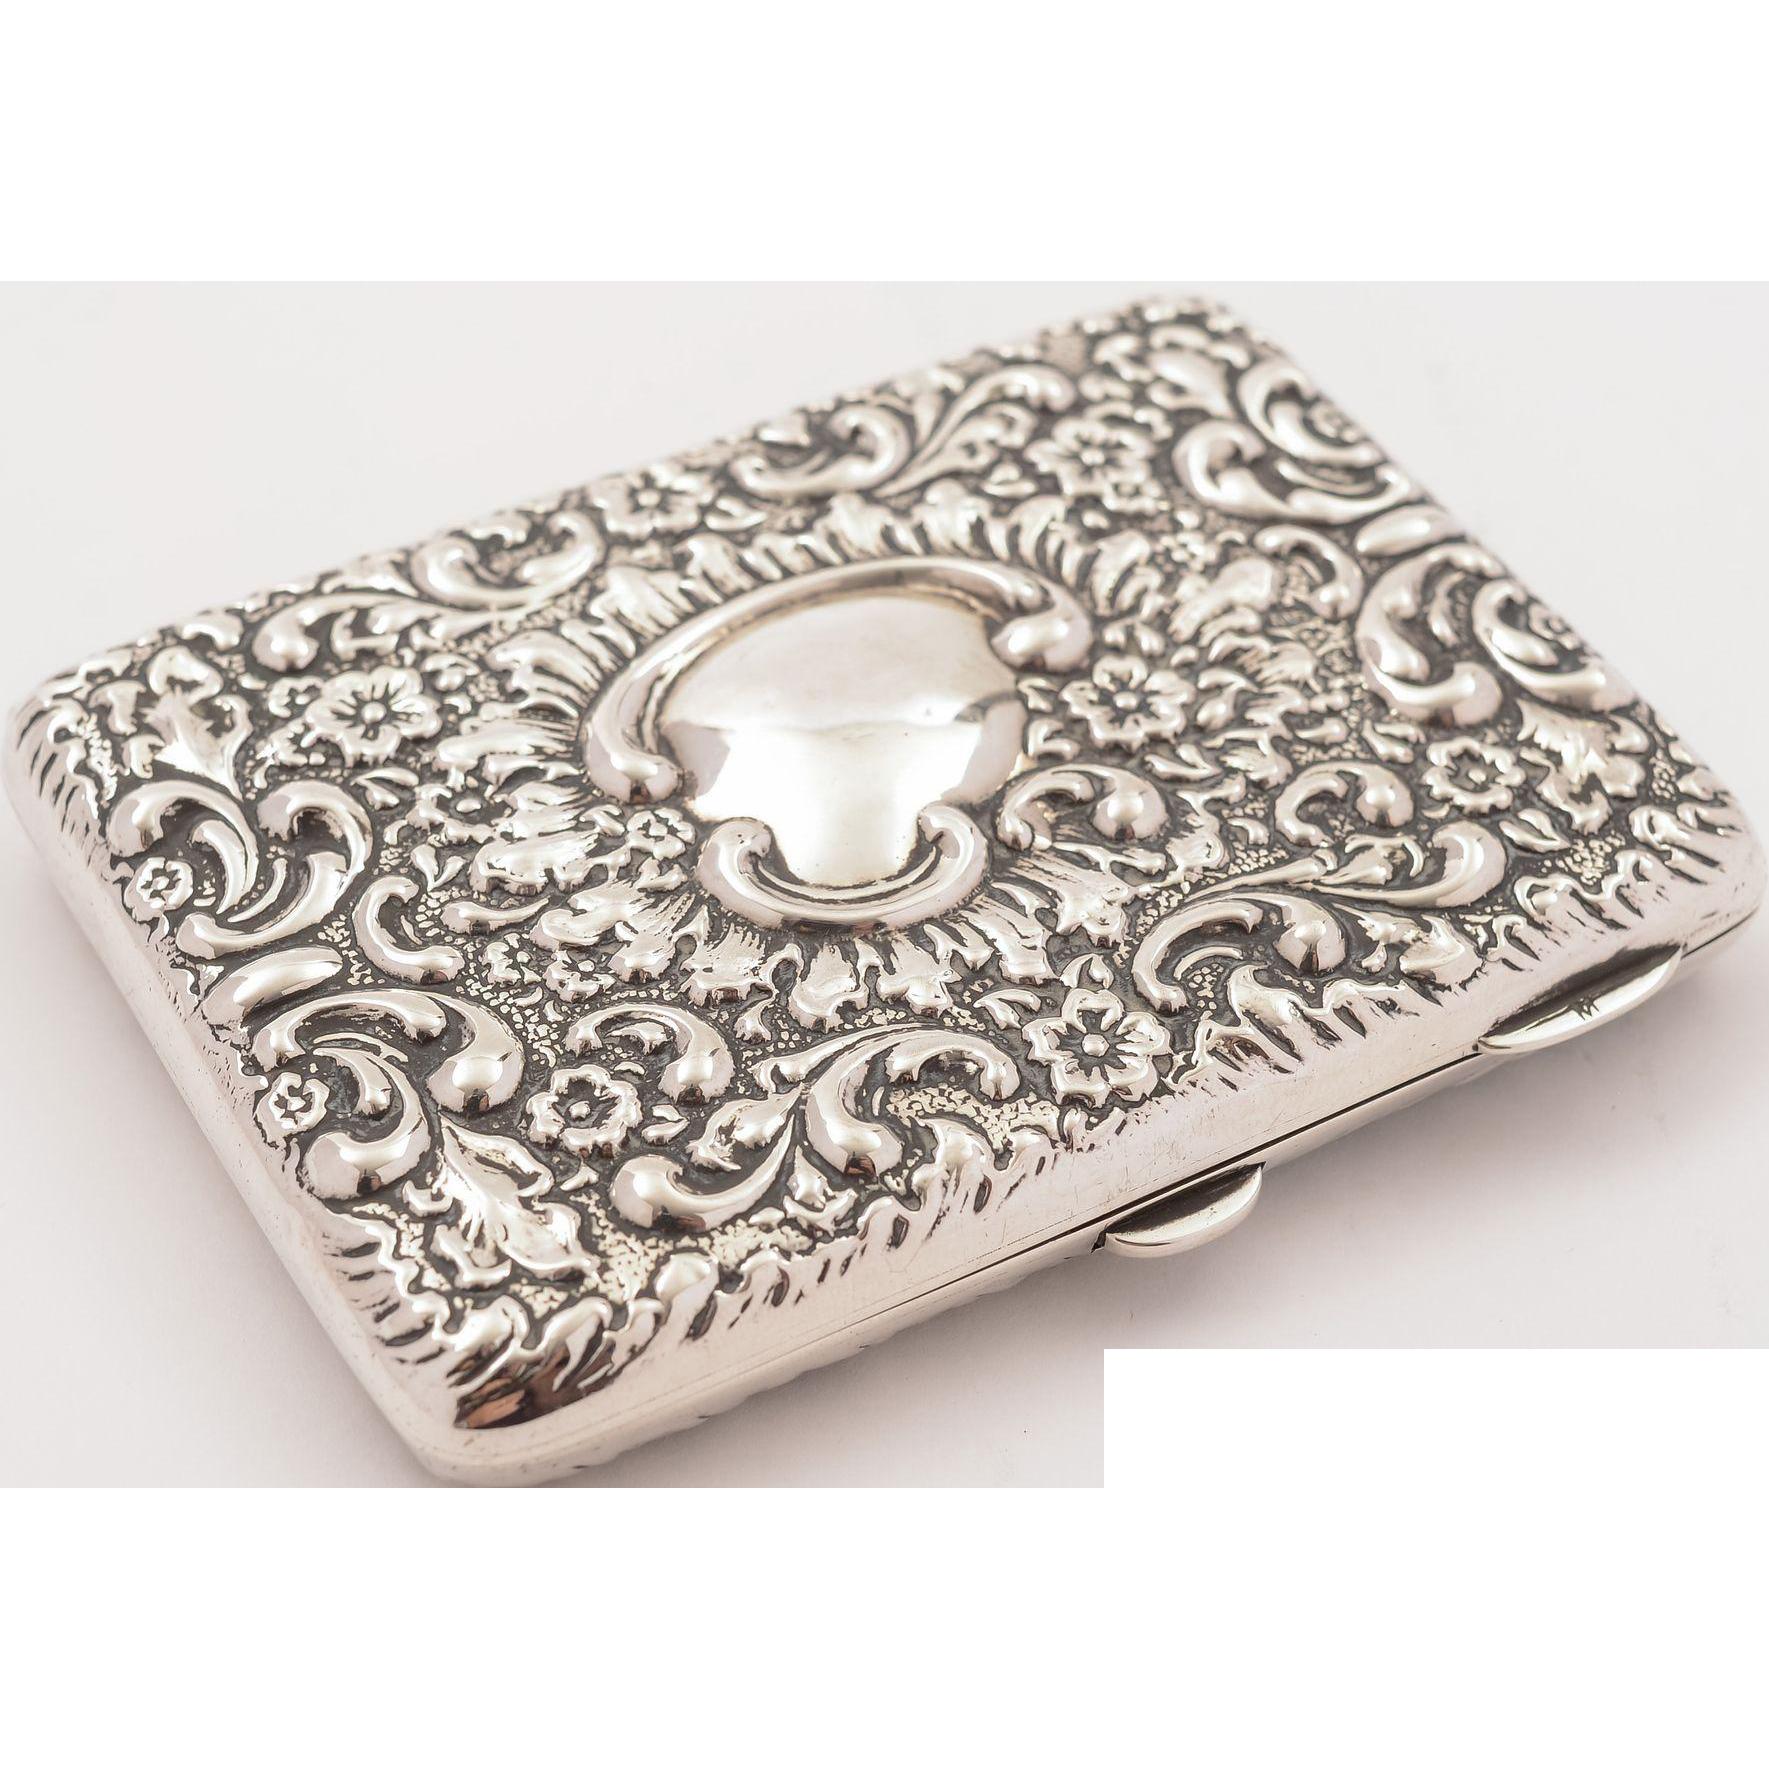 Edwardian Silver Card Case/Aide Memoire, Chester 1906